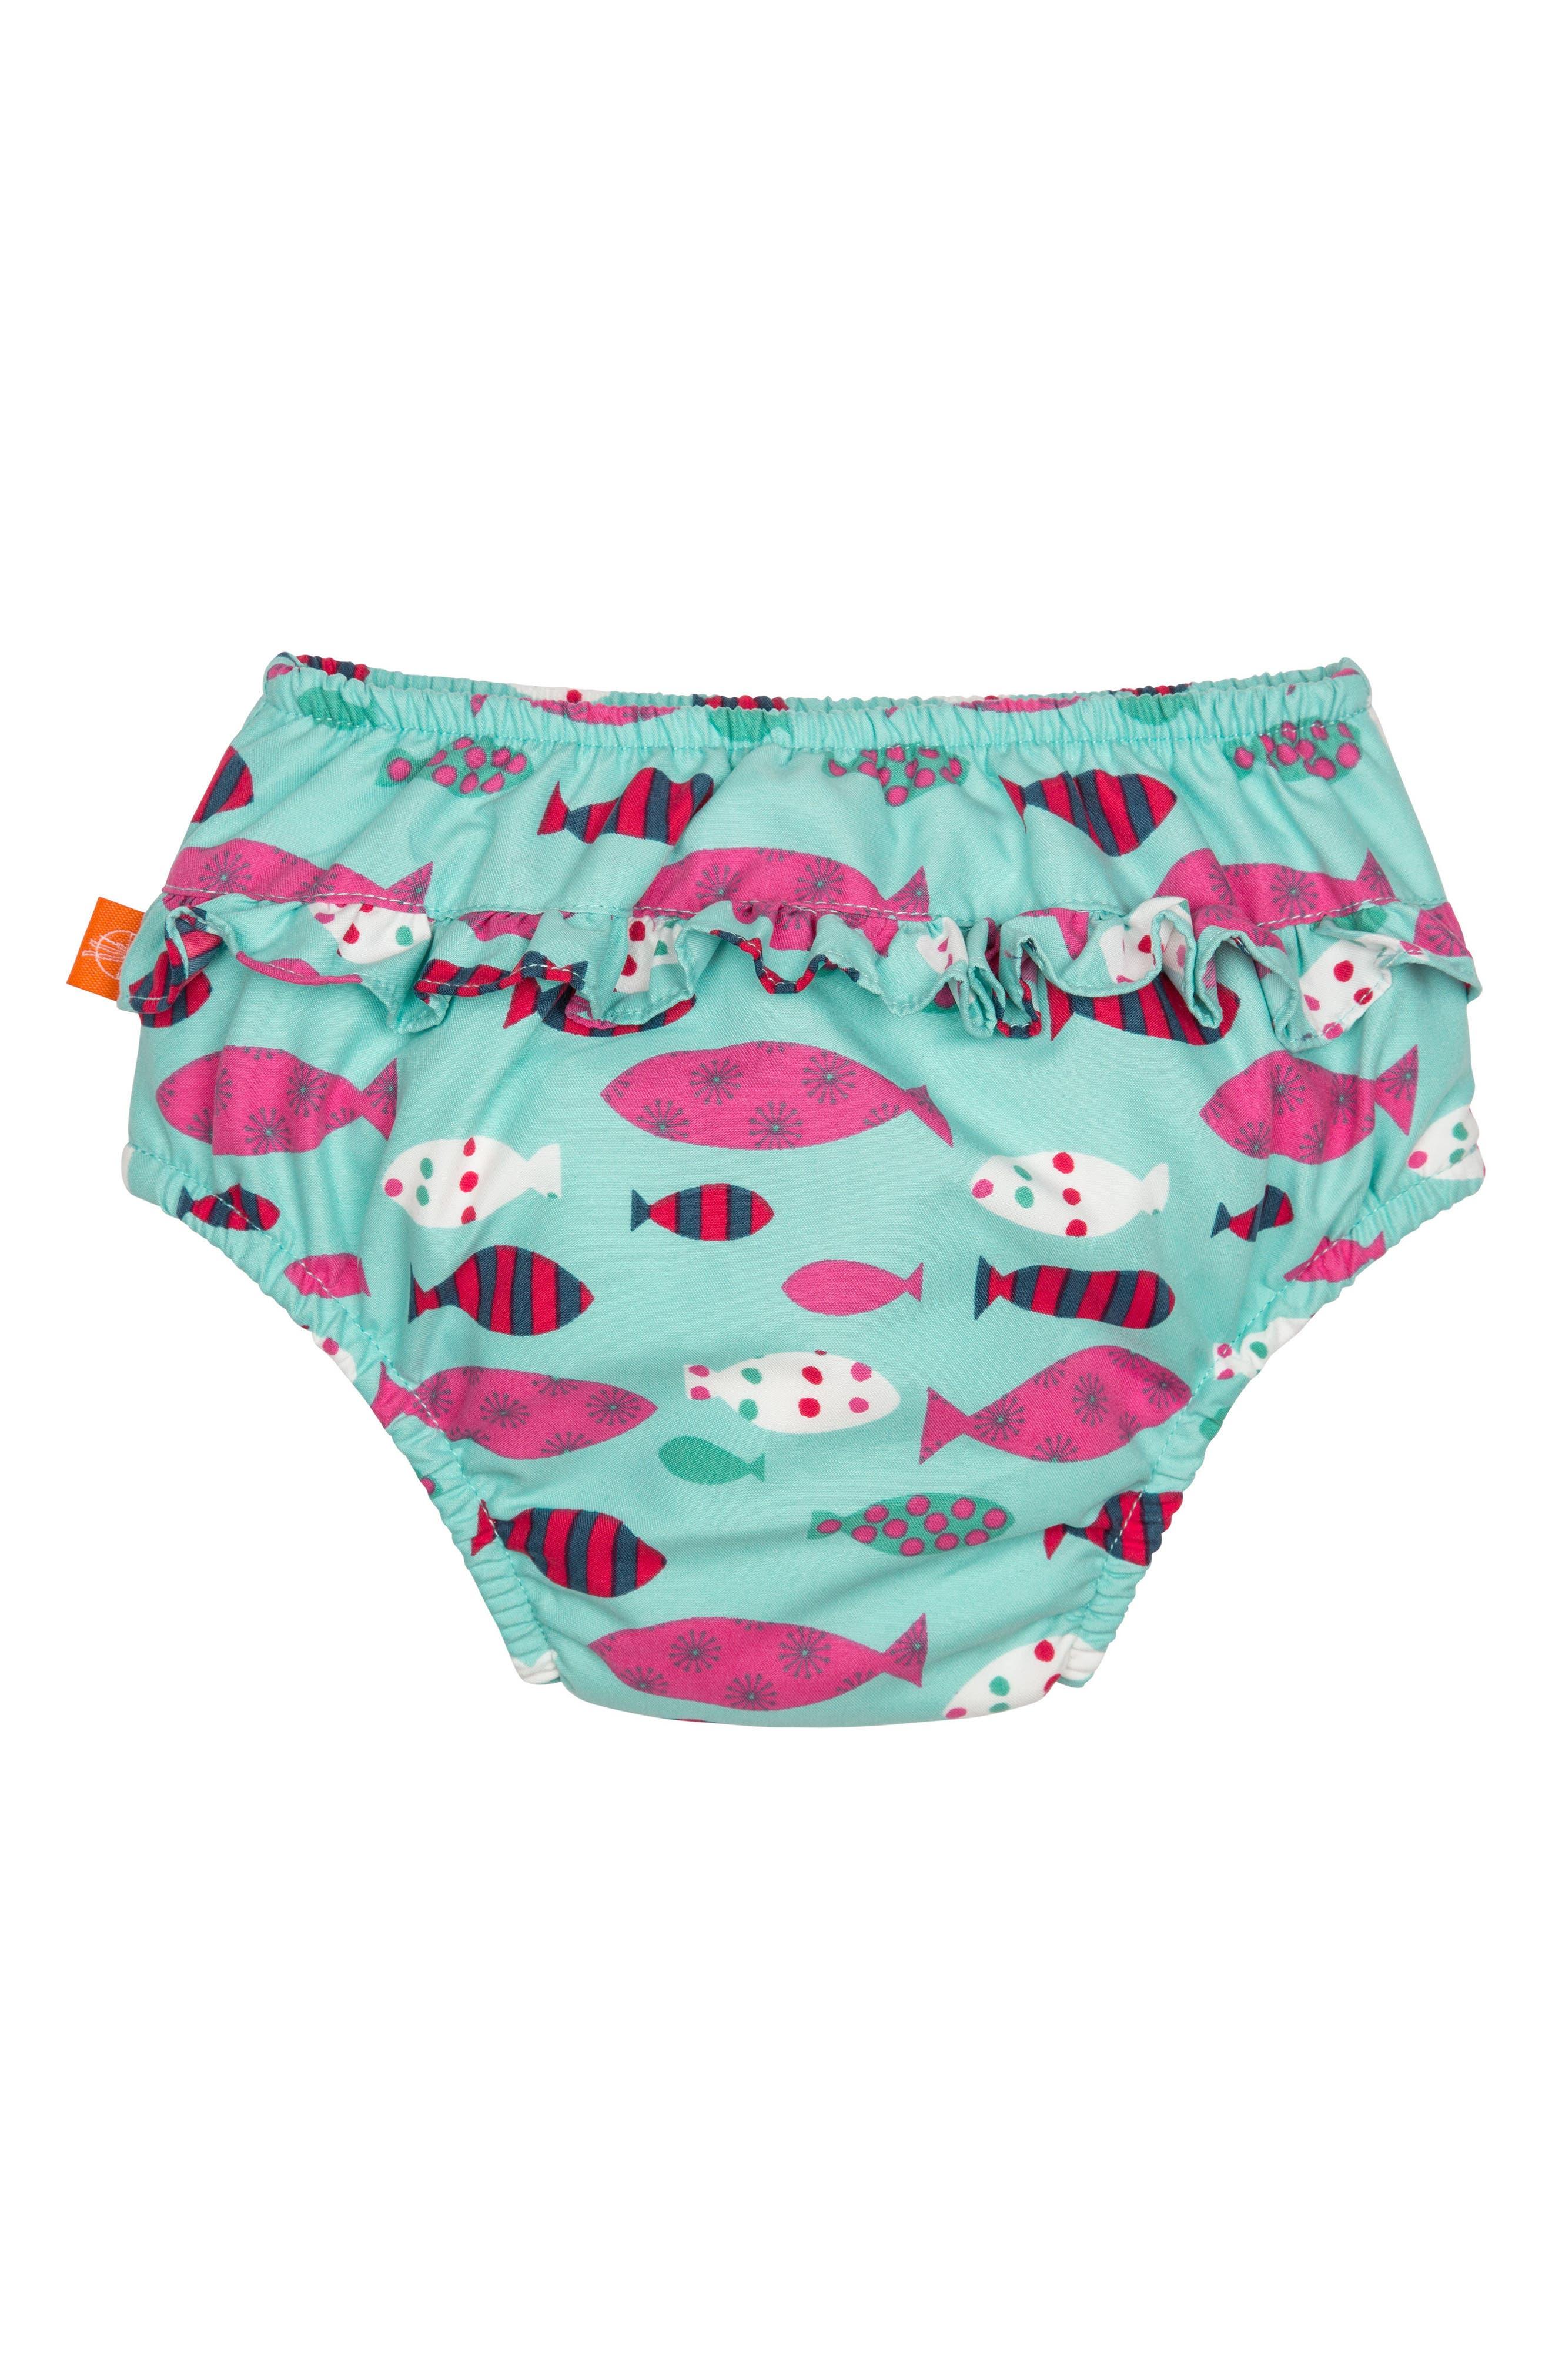 Mr. Fish Swim Diaper Cover,                             Alternate thumbnail 2, color,